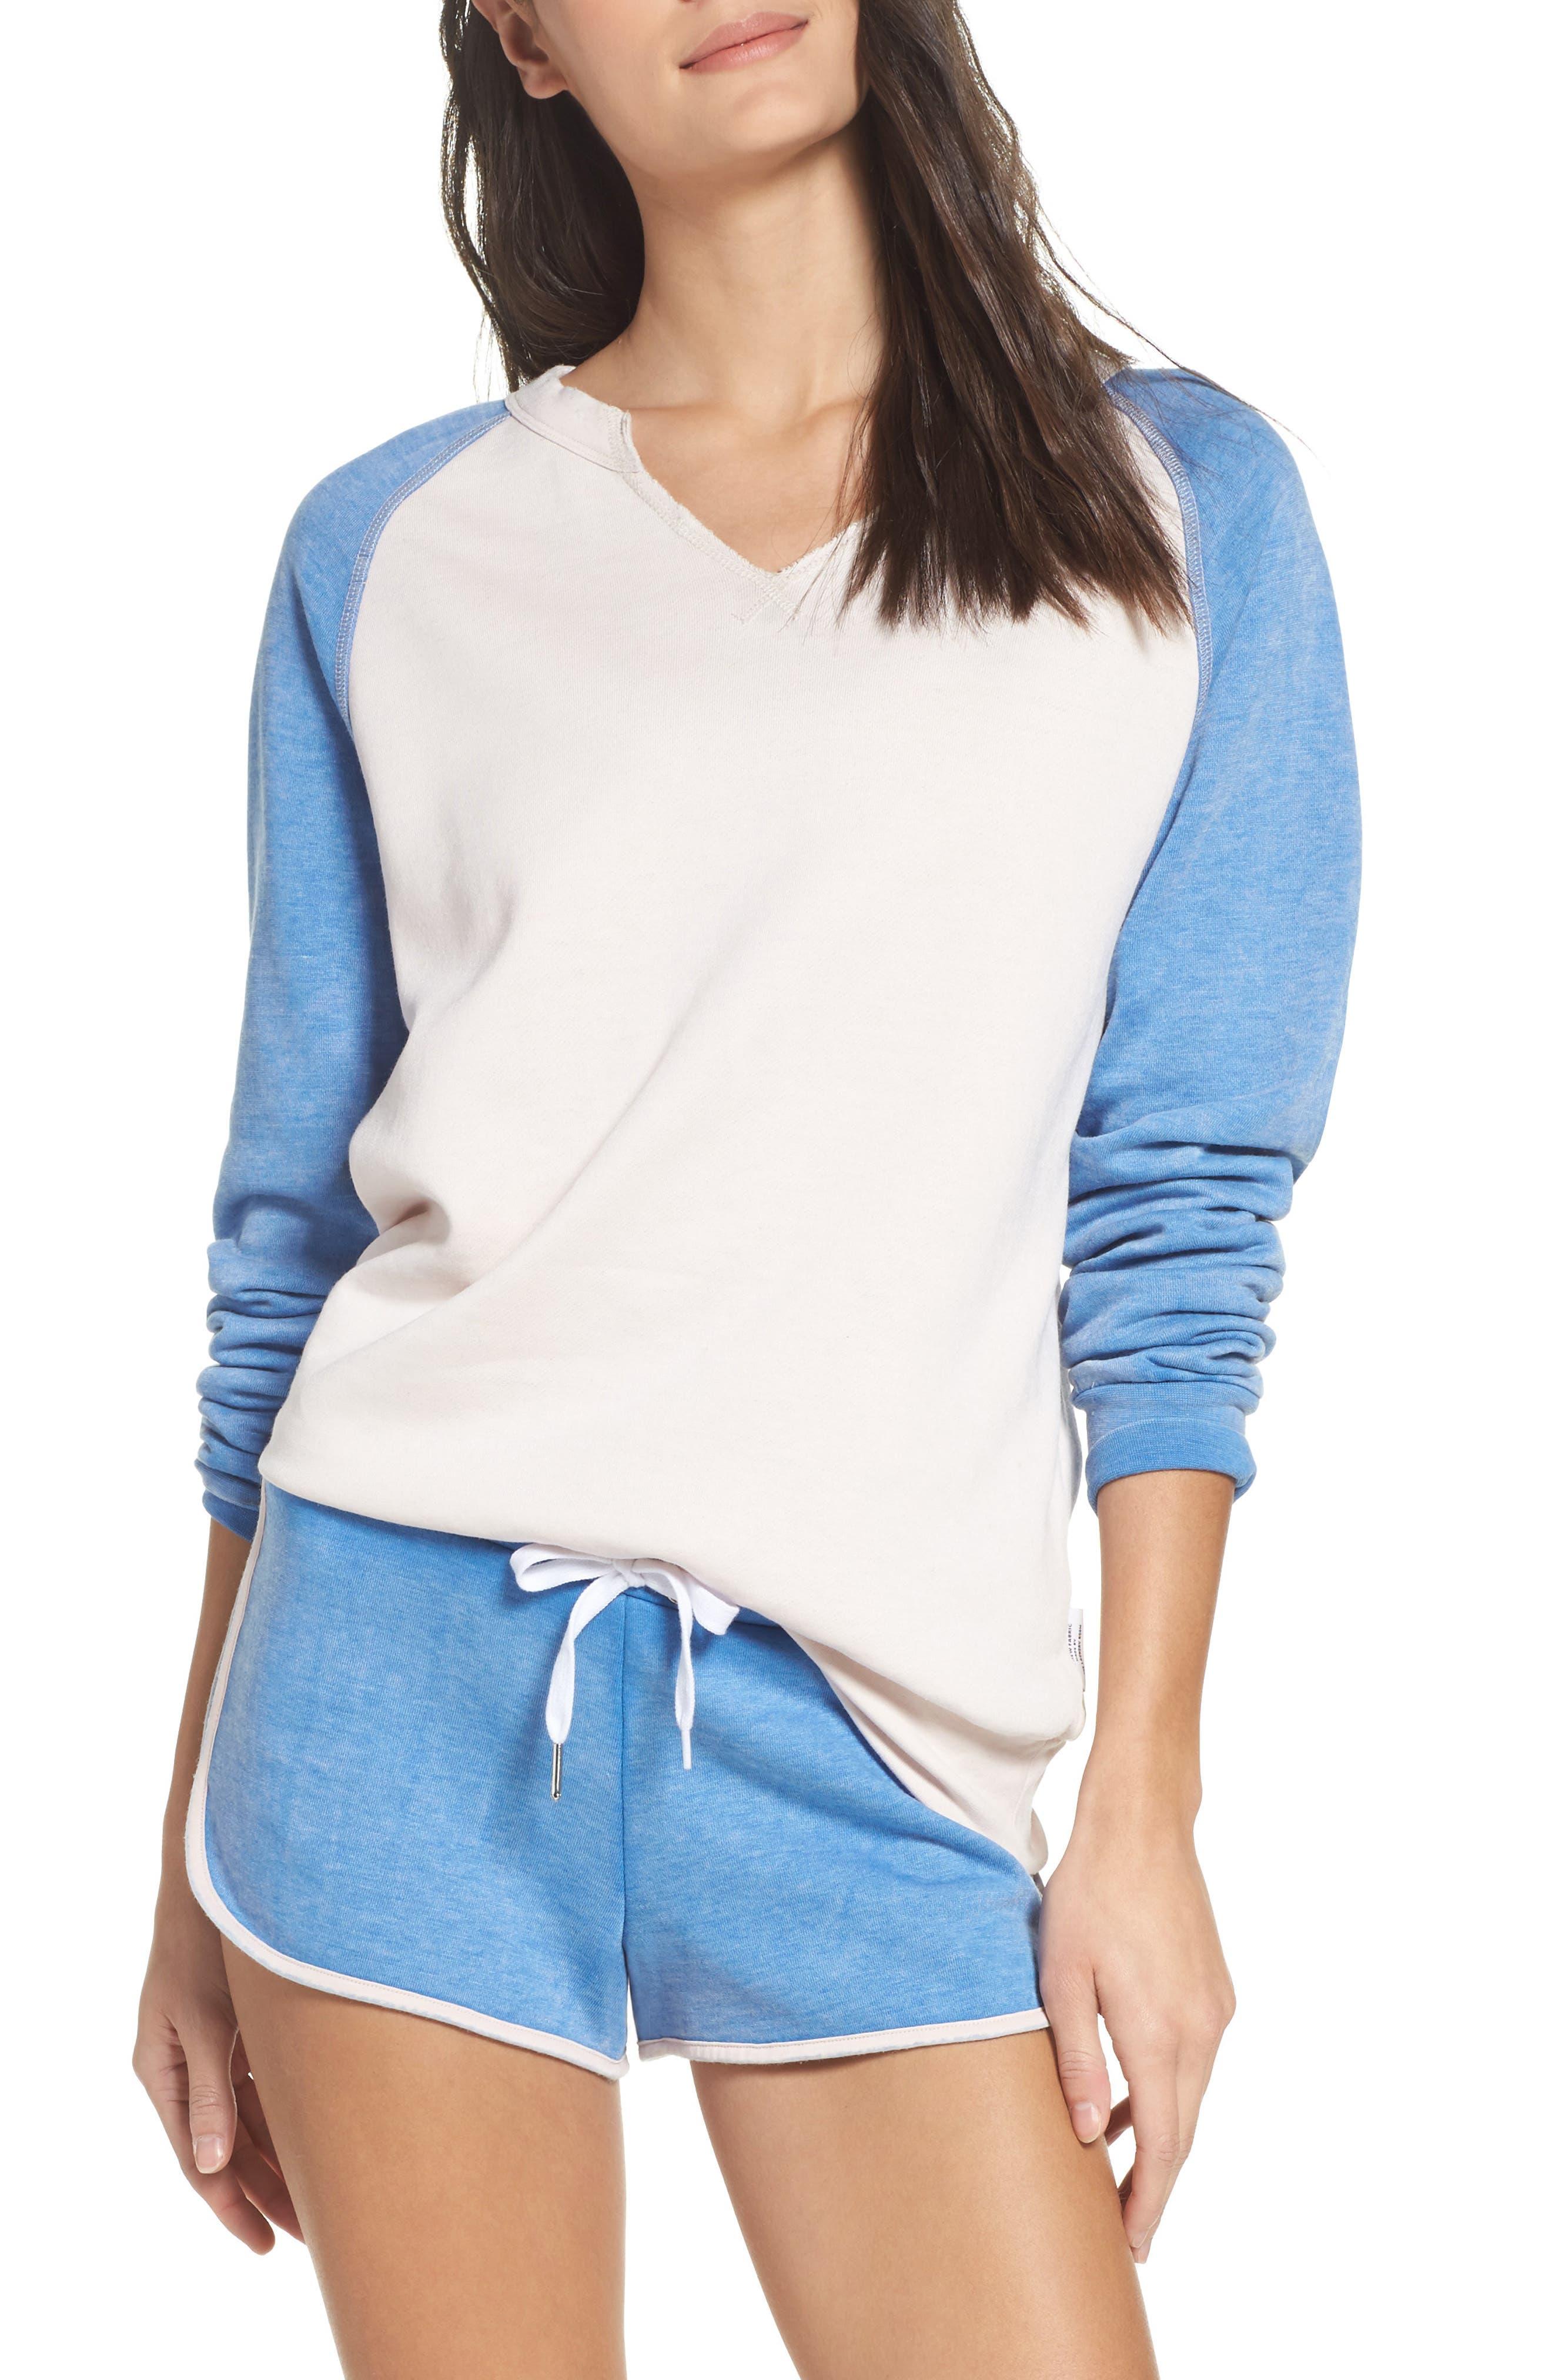 The Laundry Room Sweatshirt & Lounge Shorts